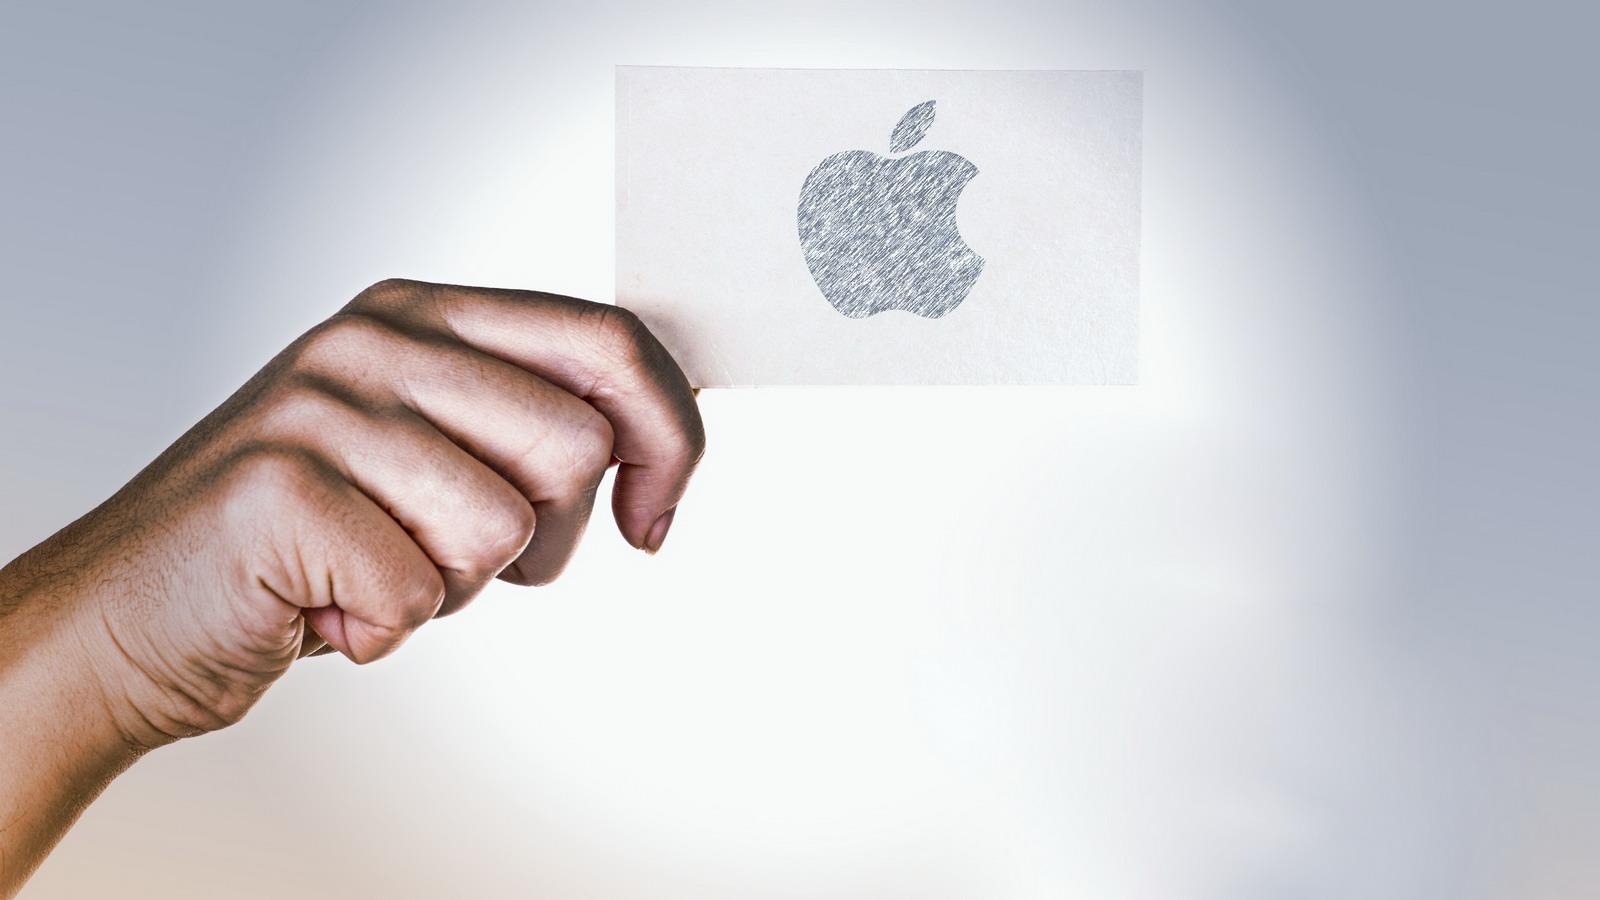 http://4.bp.blogspot.com/-vCjMf_Oho8I/TeifJRrC1lI/AAAAAAAAAzI/pLaM_yDignA/s1600/Apple+In+Hand.jpg